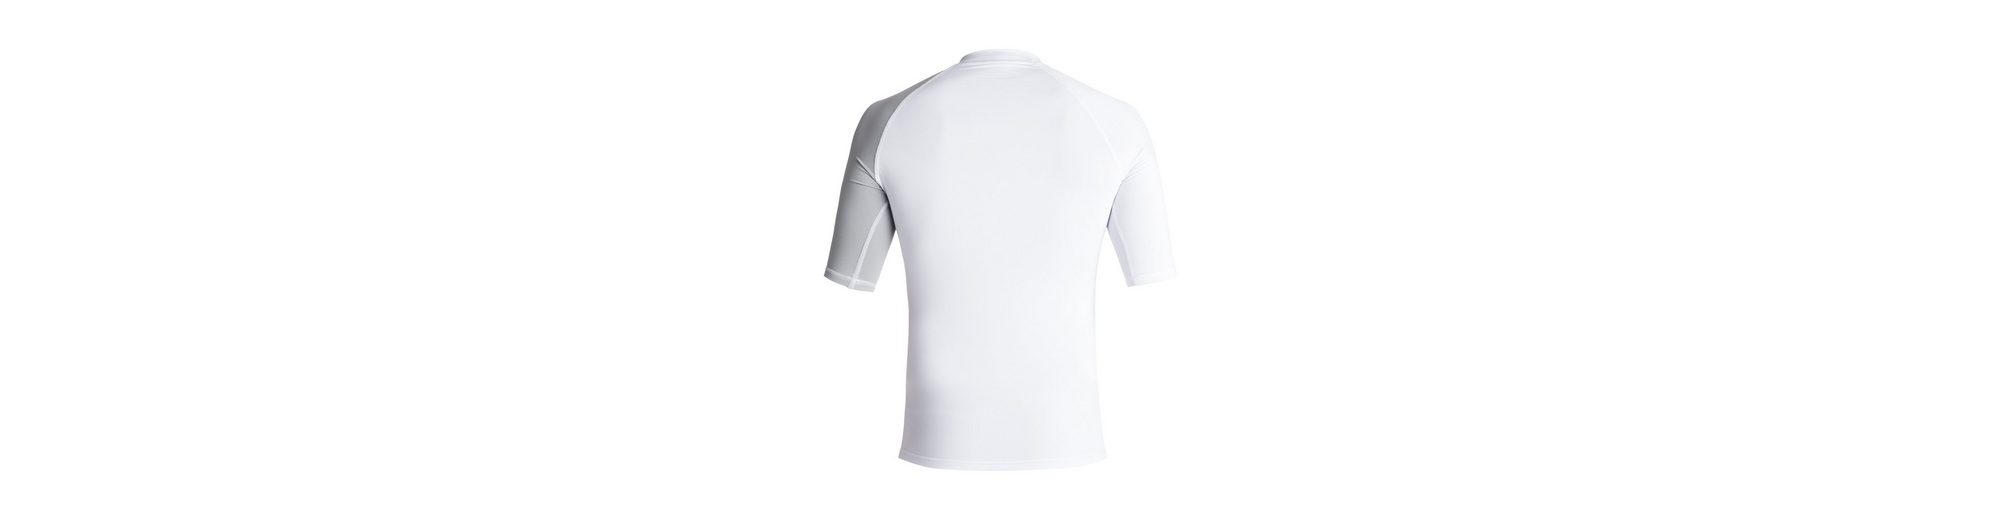 Quiksilver Kurzarm UPF 50 Rash Vest Active Eastbay Günstig Online Rabatt Echt Freies Verschiffen Fabrikverkauf MorCteLXJ